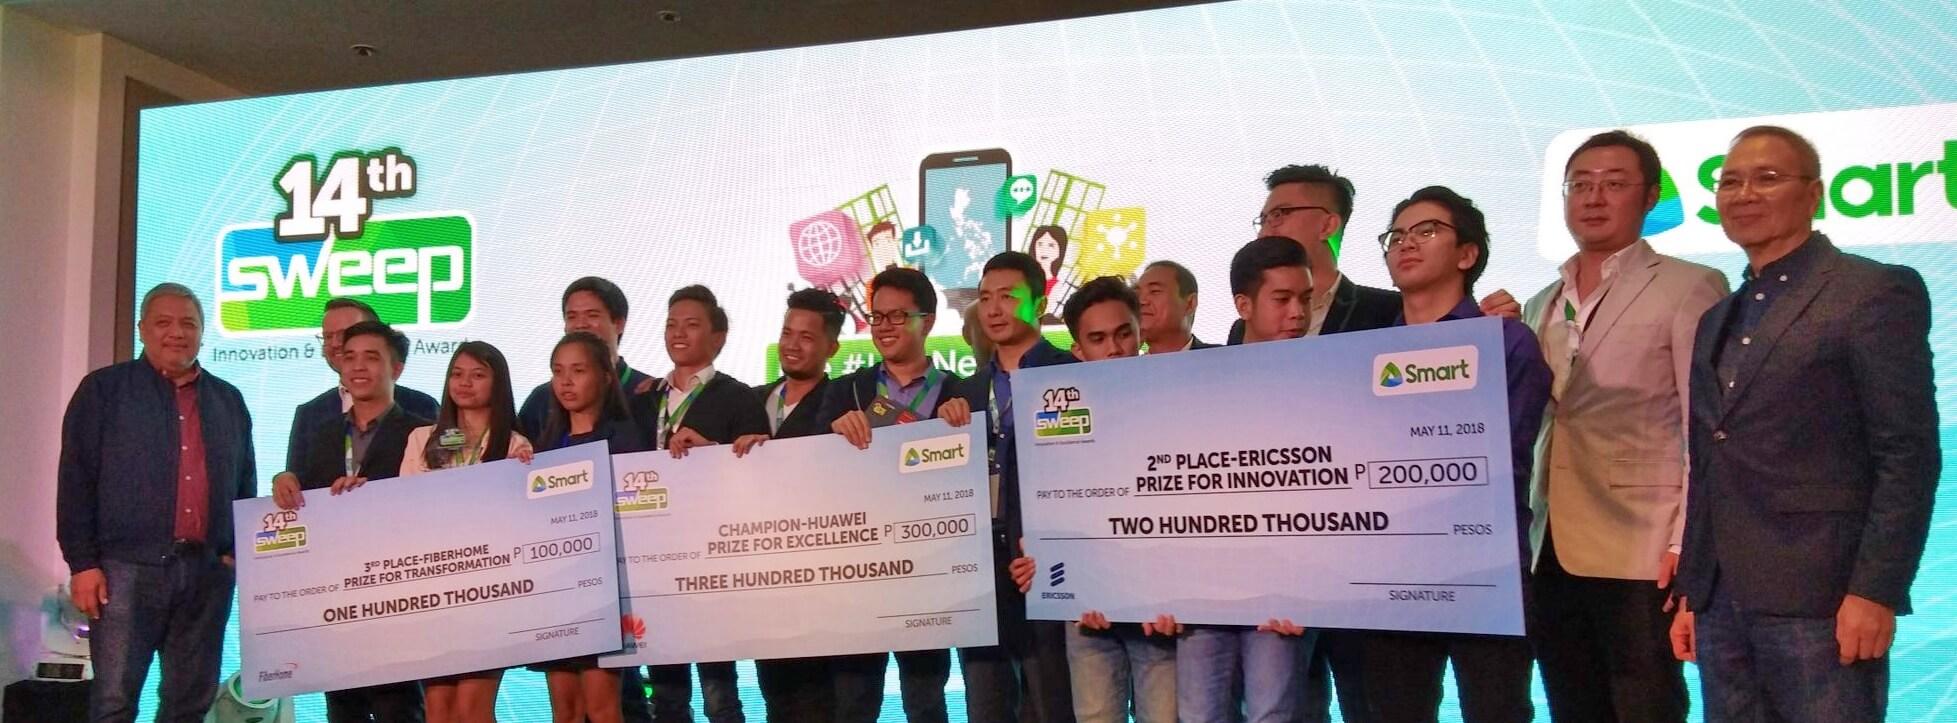 Smart Sweep winners